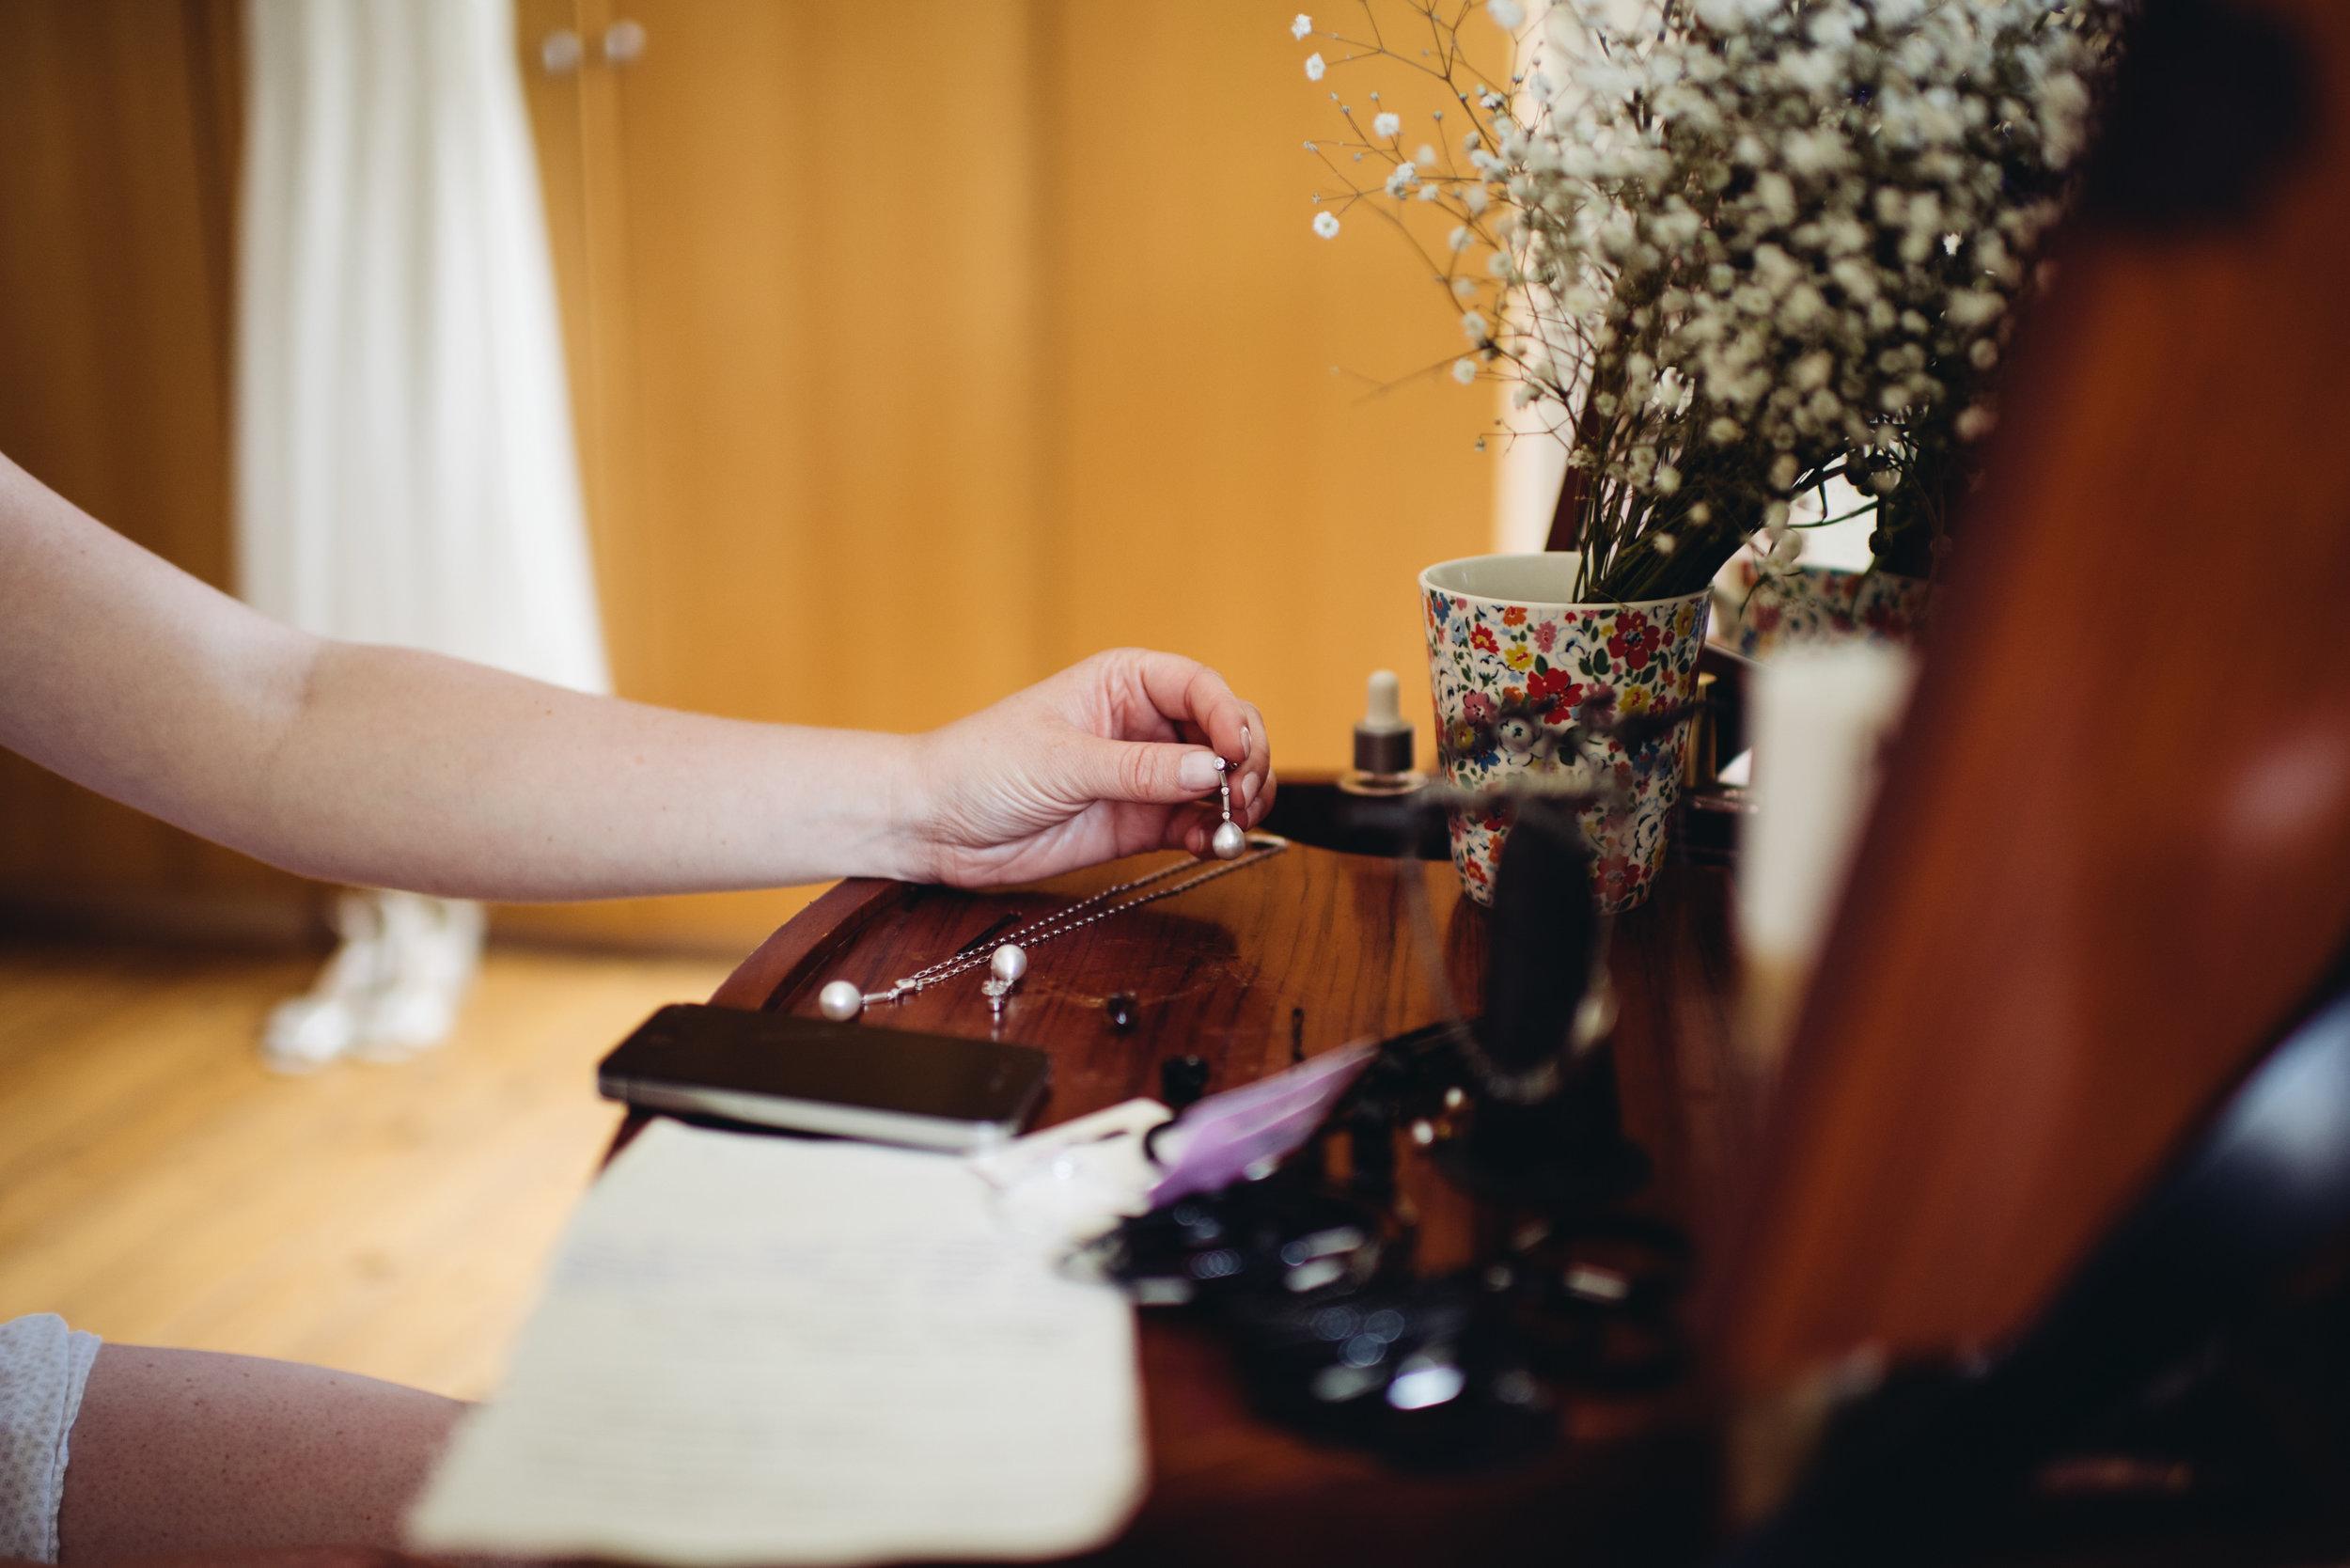 0189-LISA-DEVINE-PHOTOGRAPHY-ALTERNATIVE-WEDDING-PHOTOGRAPHY-SCOTLAND-DESTINATION-WEDDINGS-GLASGOW-WEDDINGS-COOL-WEDDINGS-STYLISH-WEDDINGS.JPG